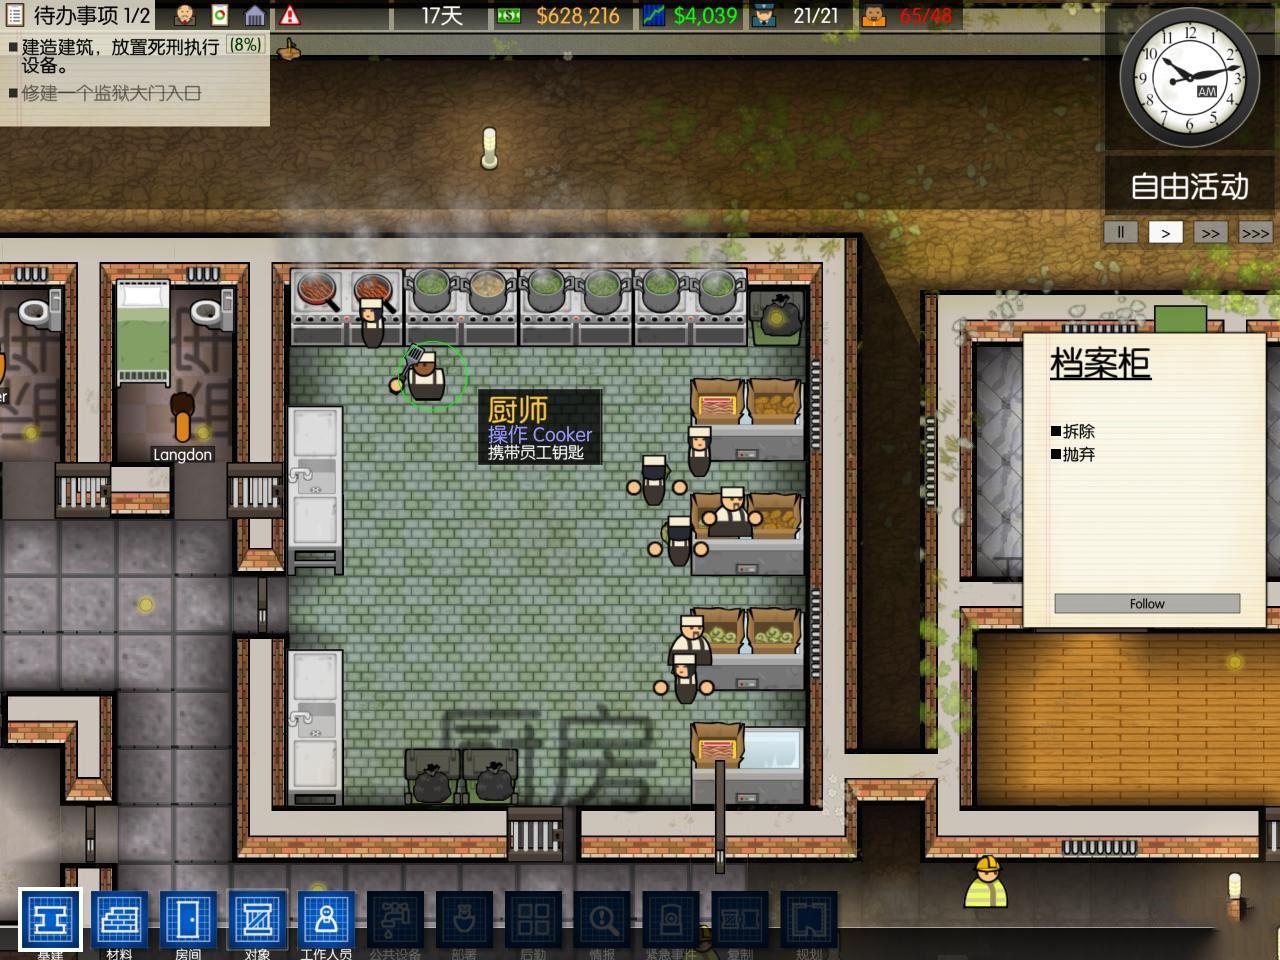 监狱建筑师 Prison Architect